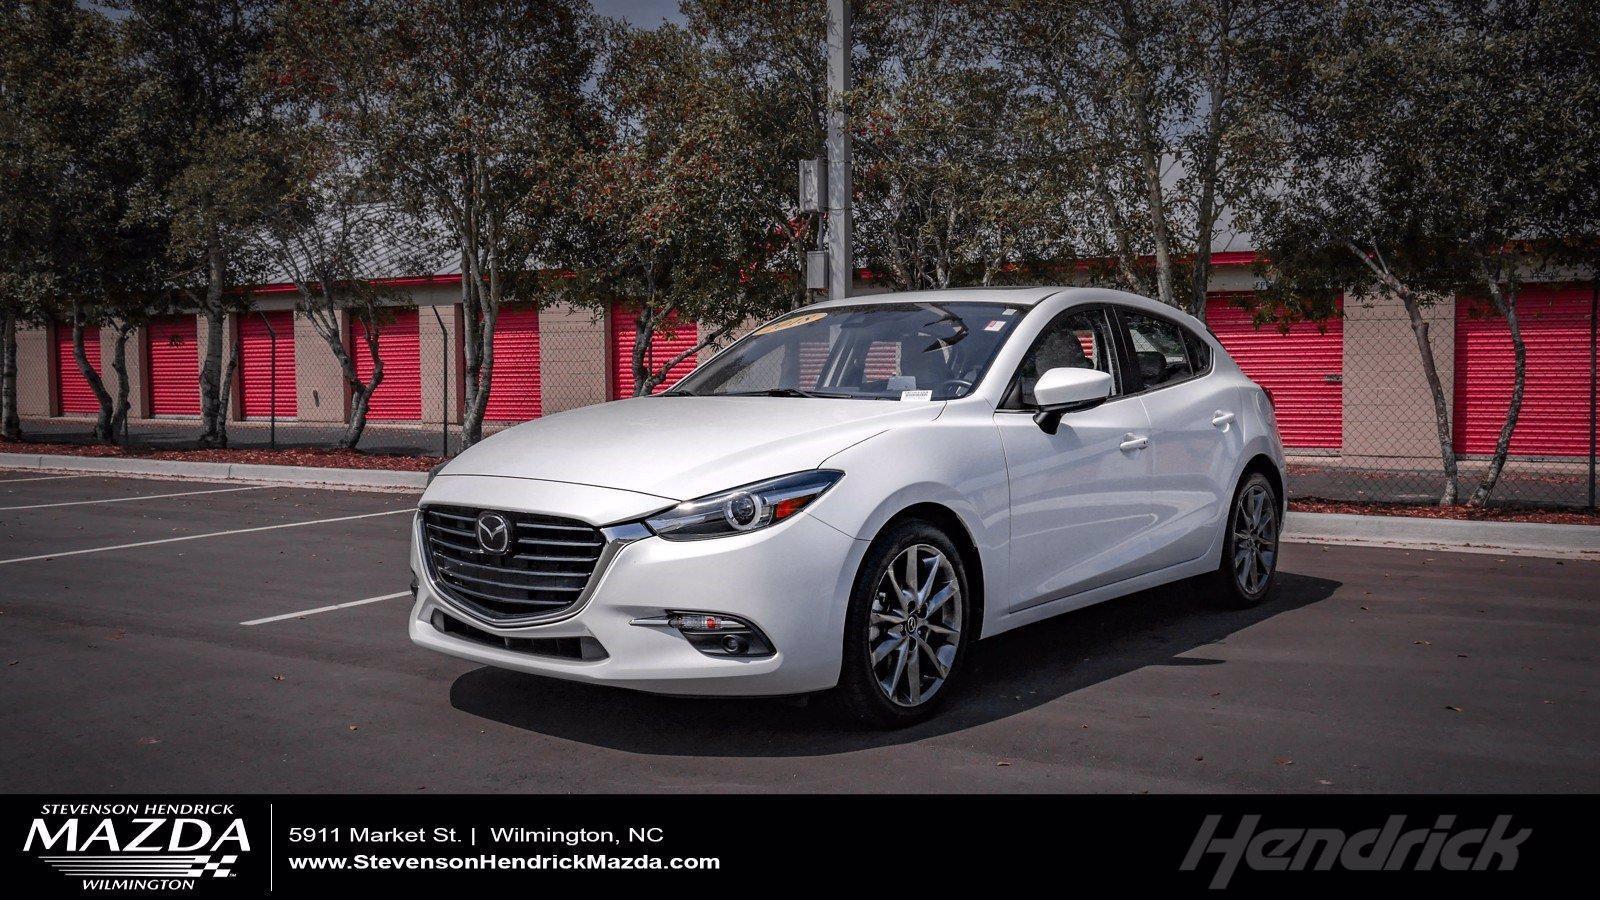 2018 Mazda Mazda3 5-Door Vehicle Photo in Wilmington, NC 28405